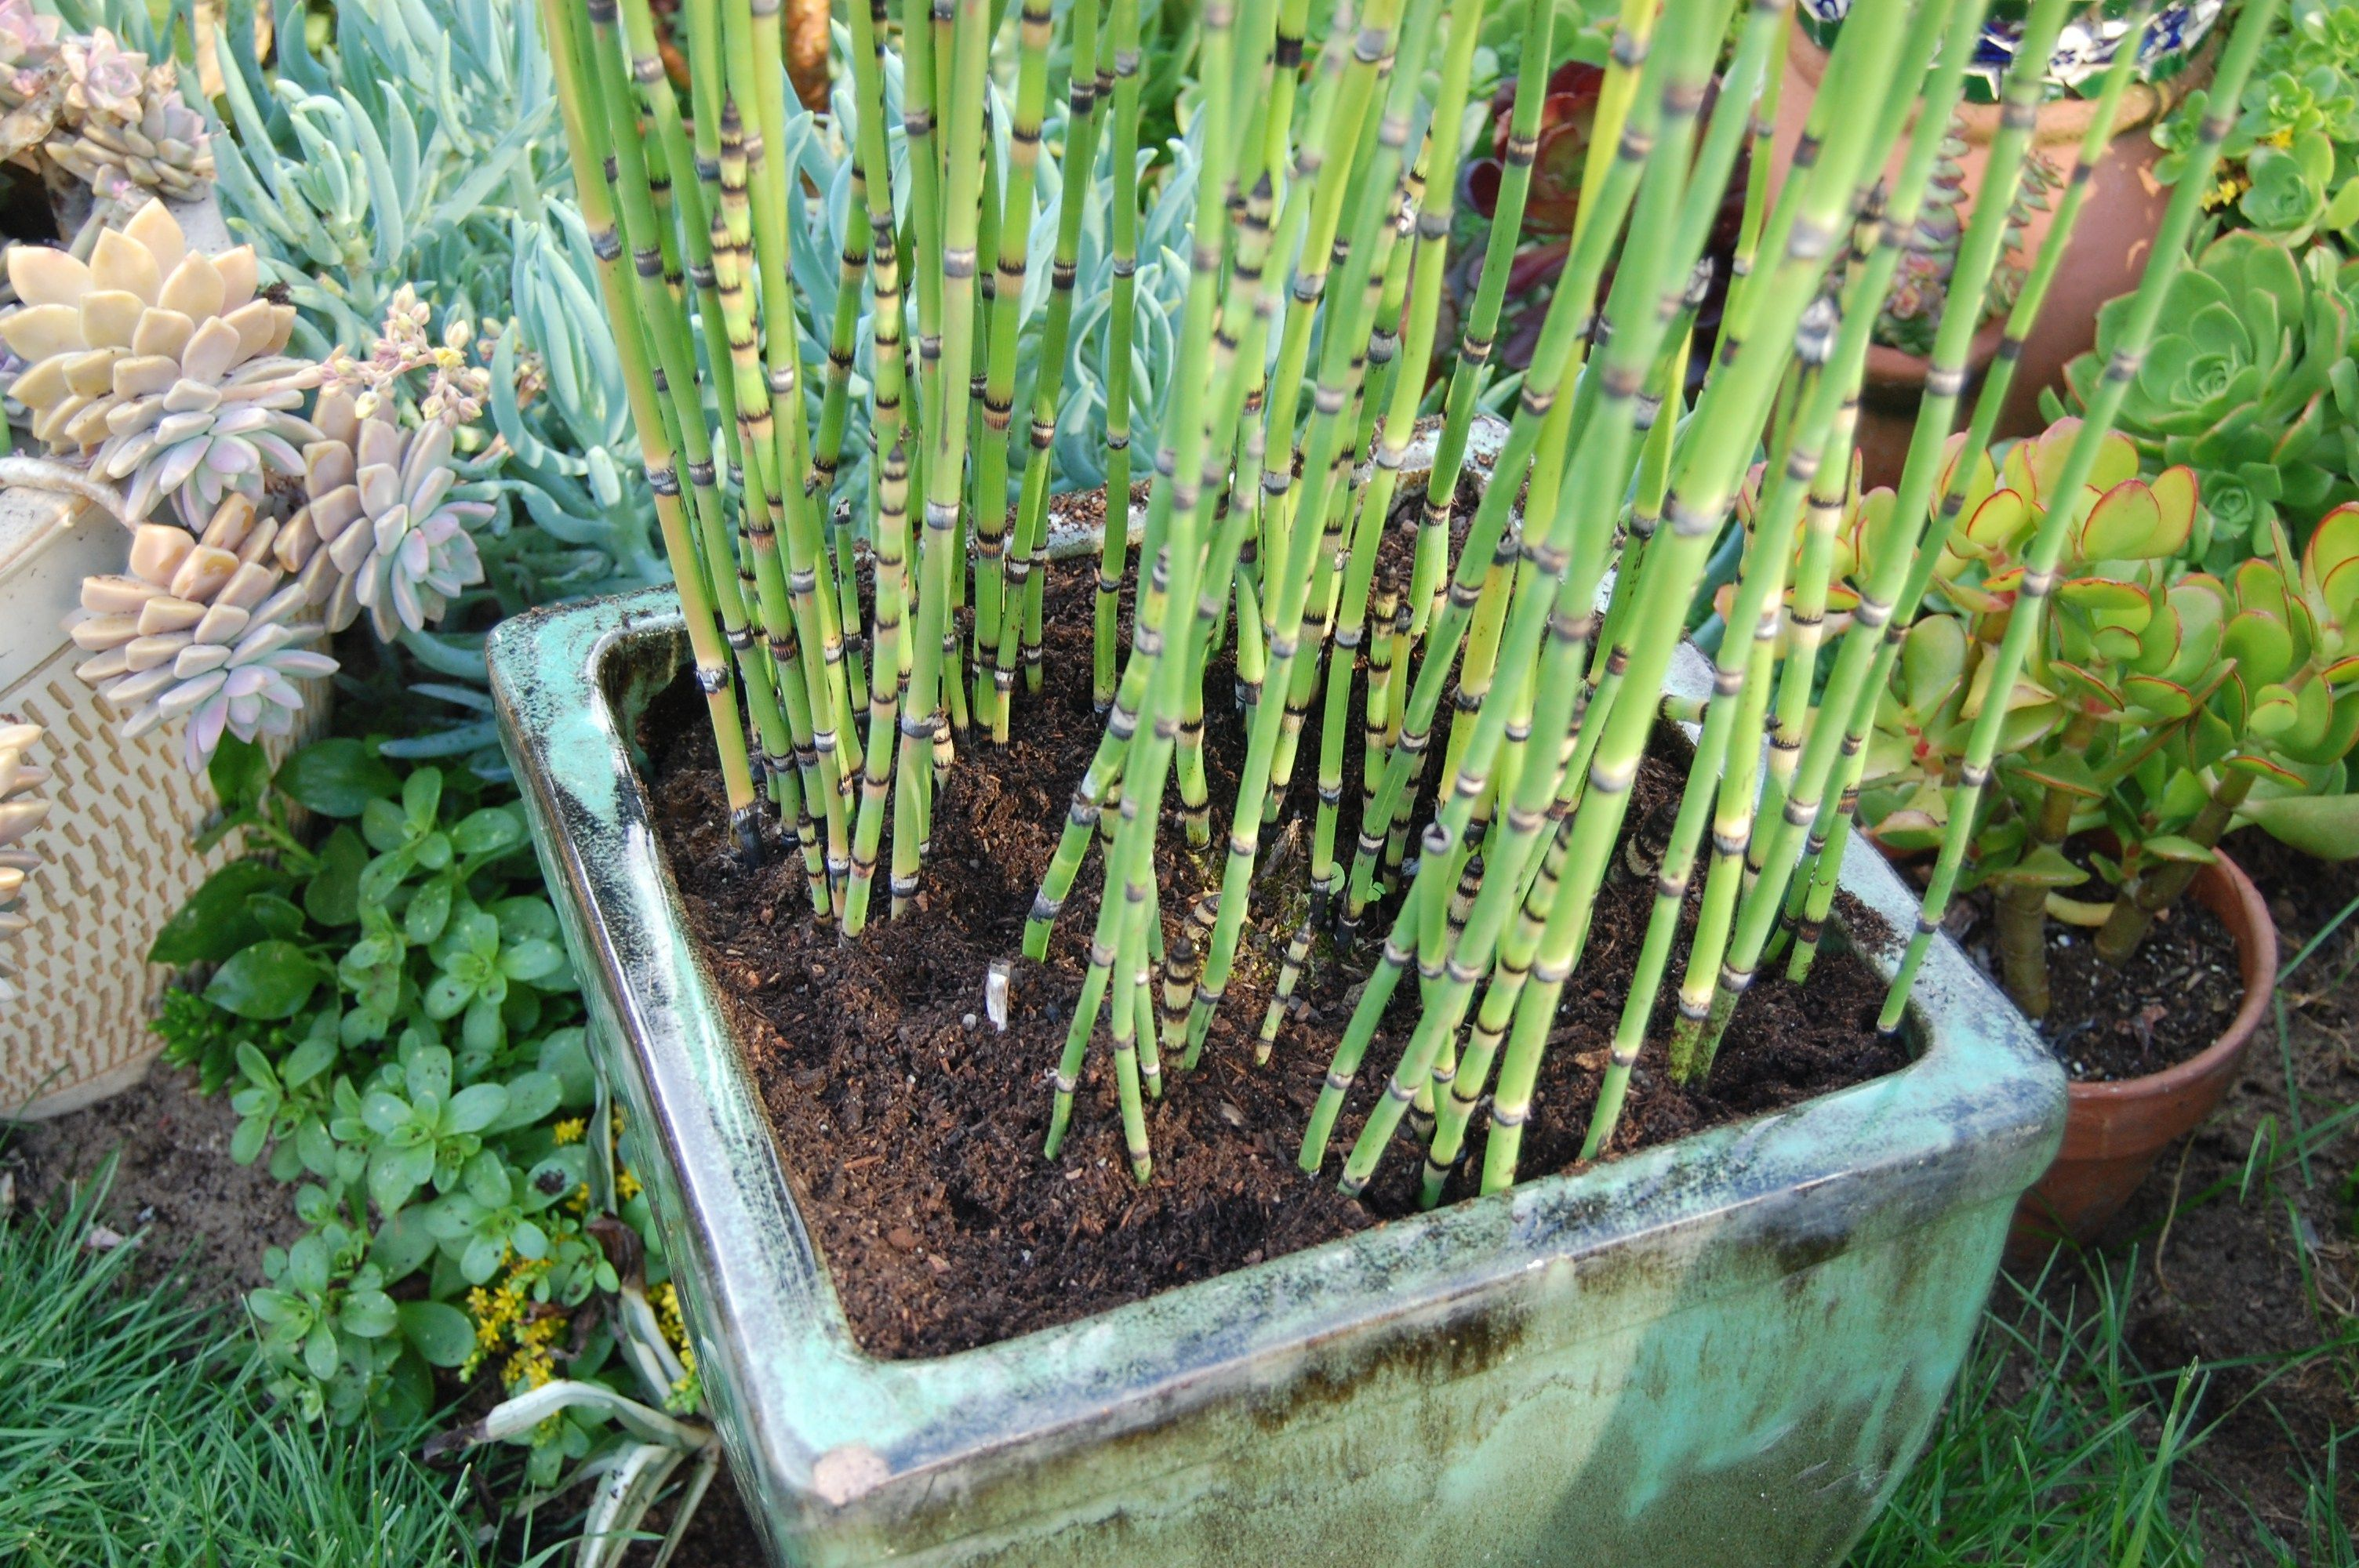 33271cea730409c52113f89b4605d303 - How To Get Rid Of Reeds In A Field